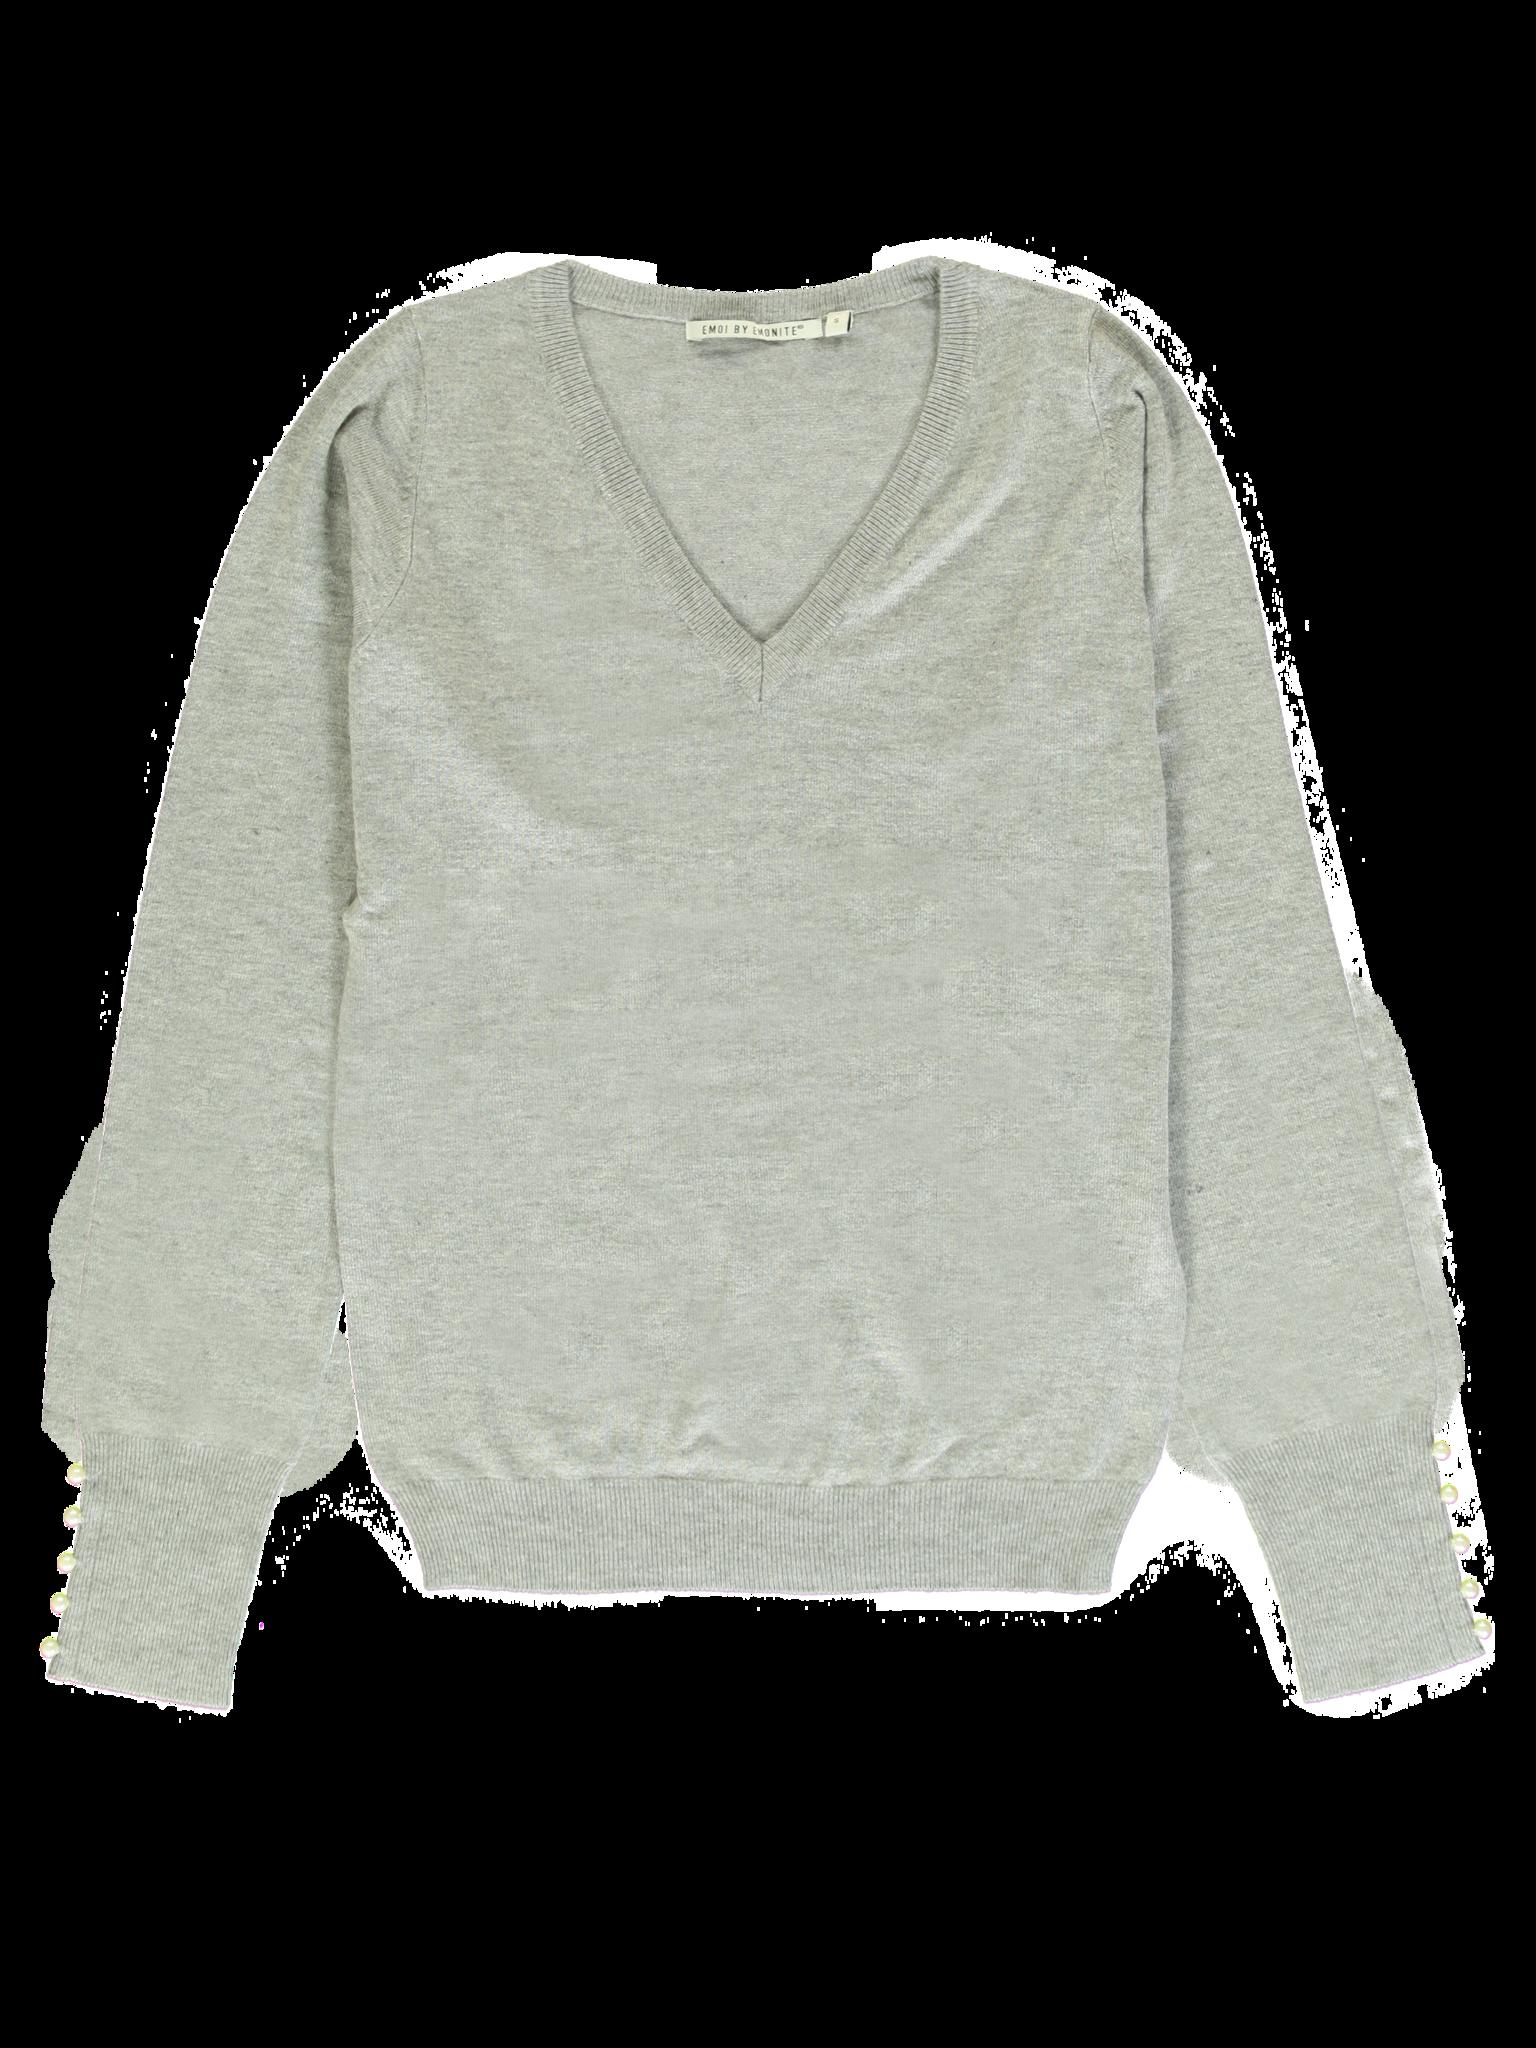 All Brands | Winterproducts Ladies | Pull | 24 pcs/box